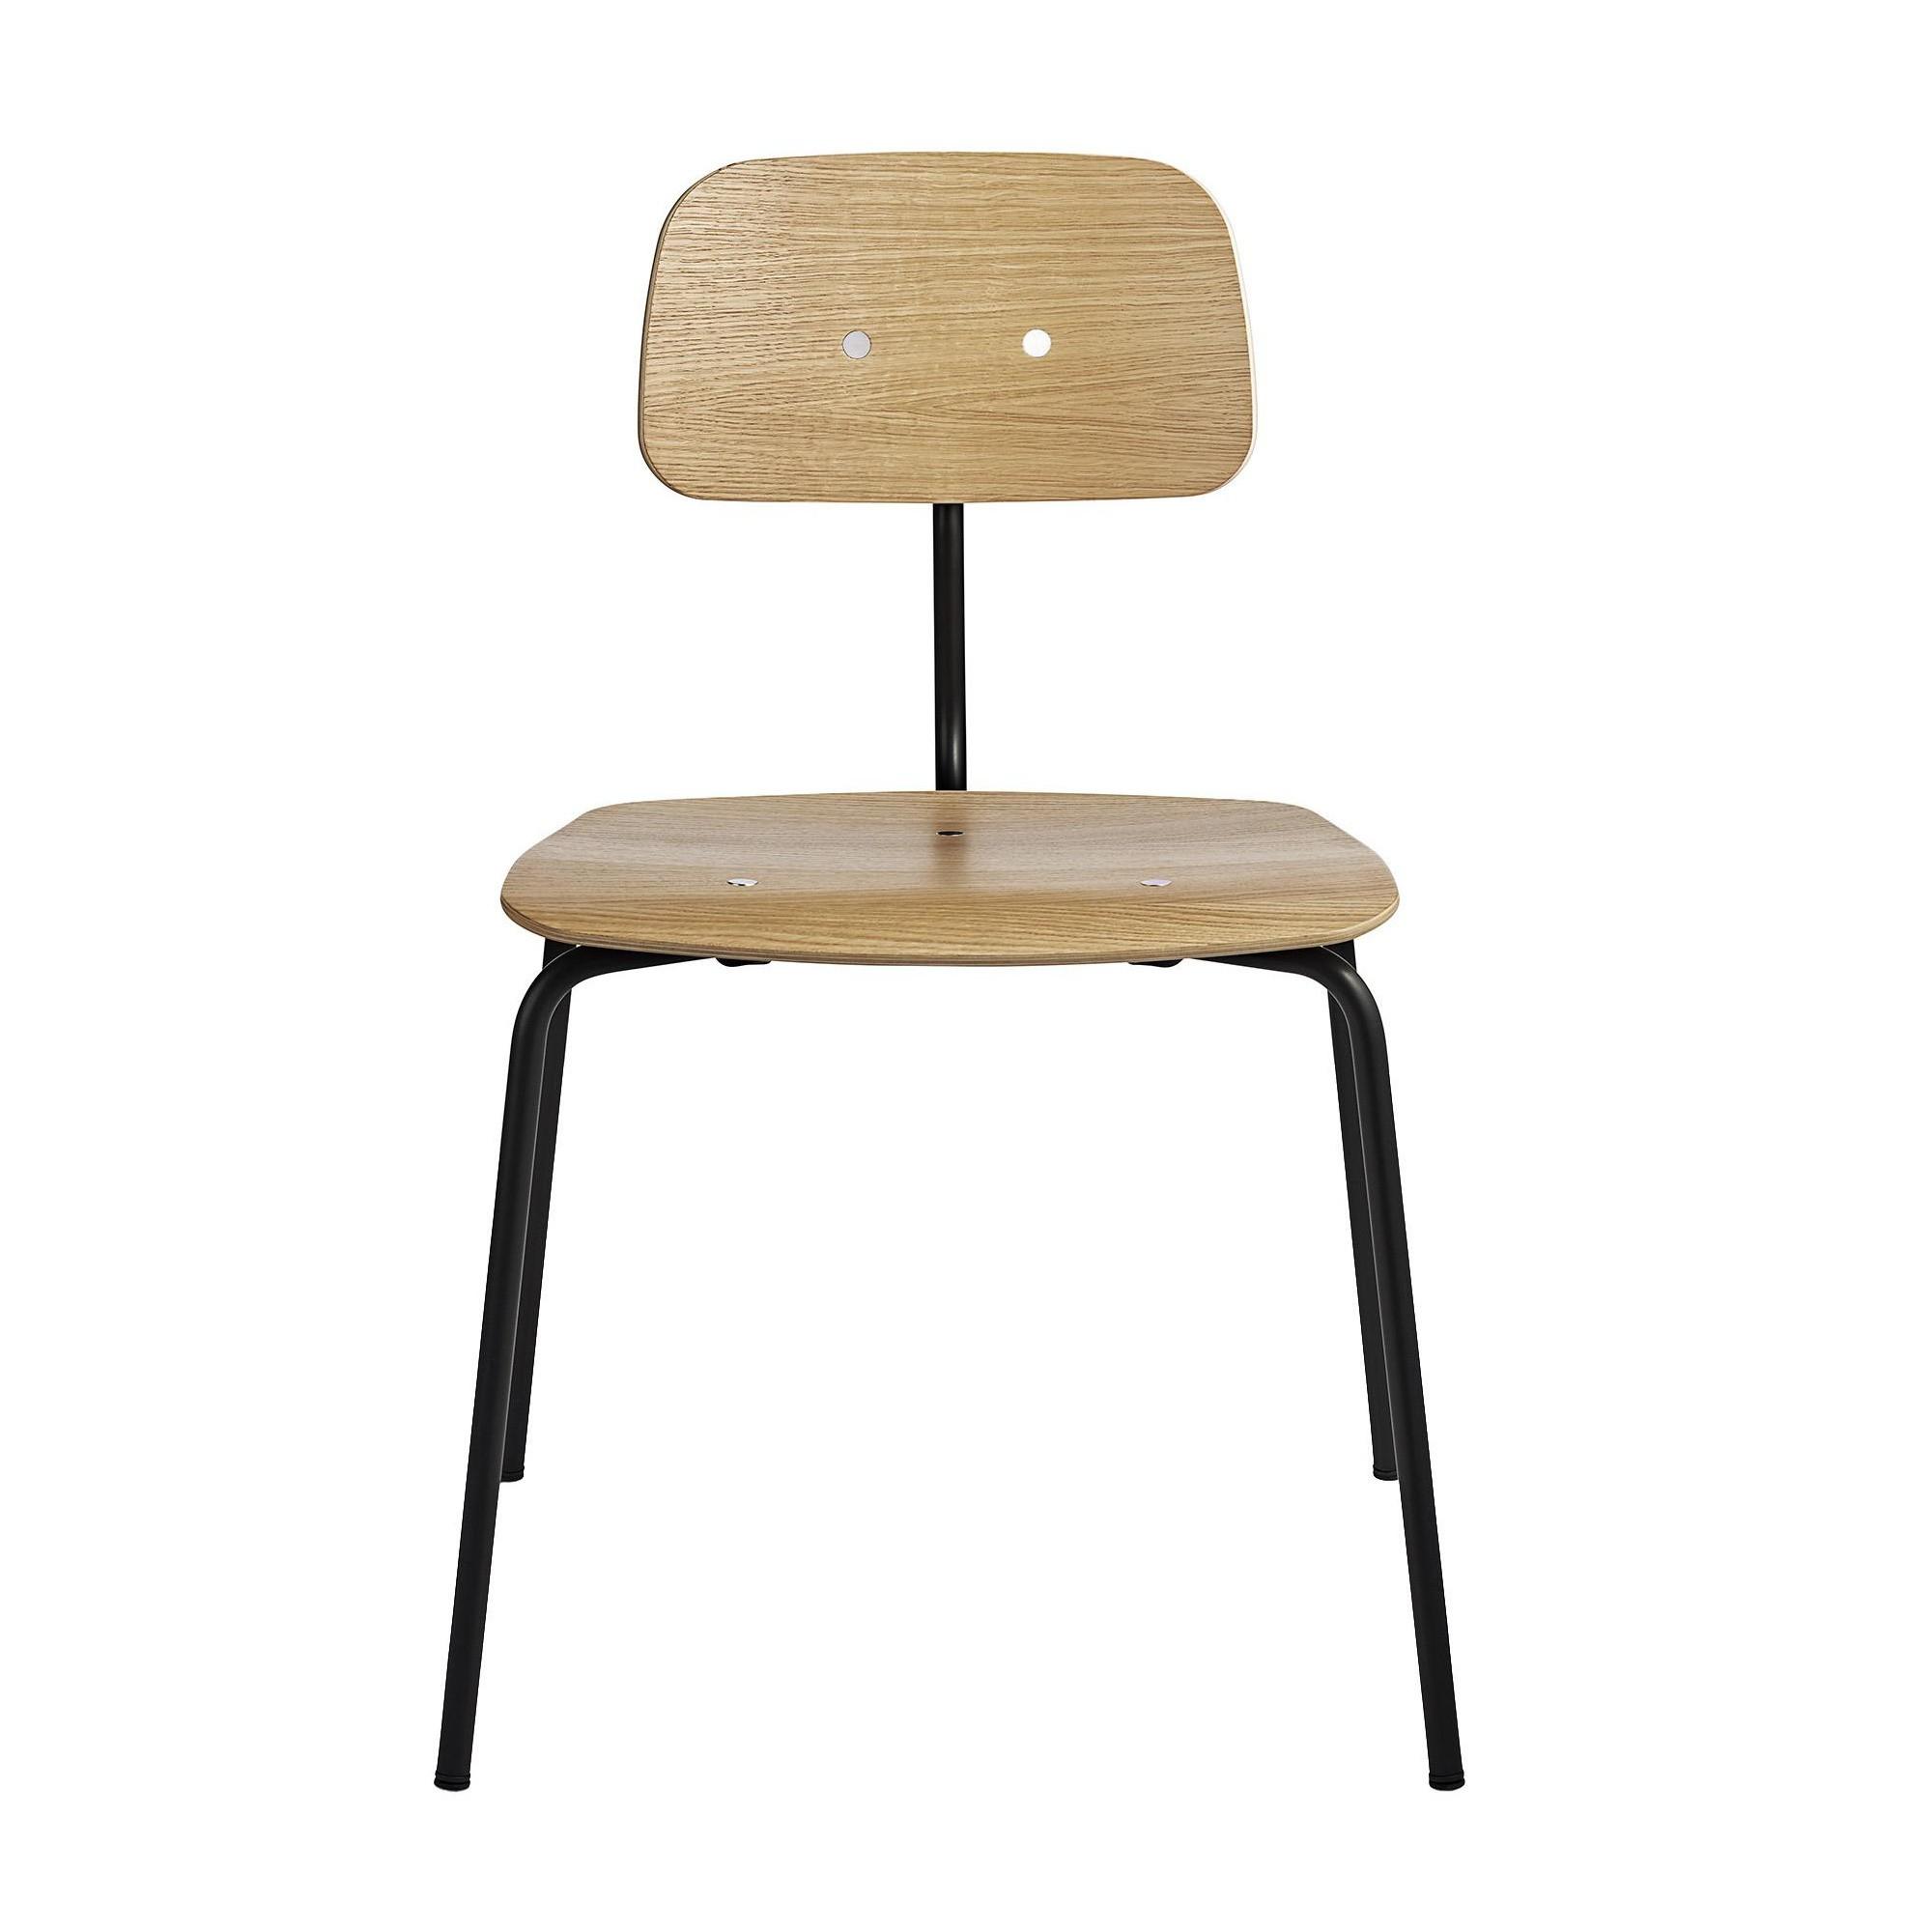 air chair frame xkcd desk engelbrechts kevi 2060 ambientedirect oak hxwxd 79x53x51cm black